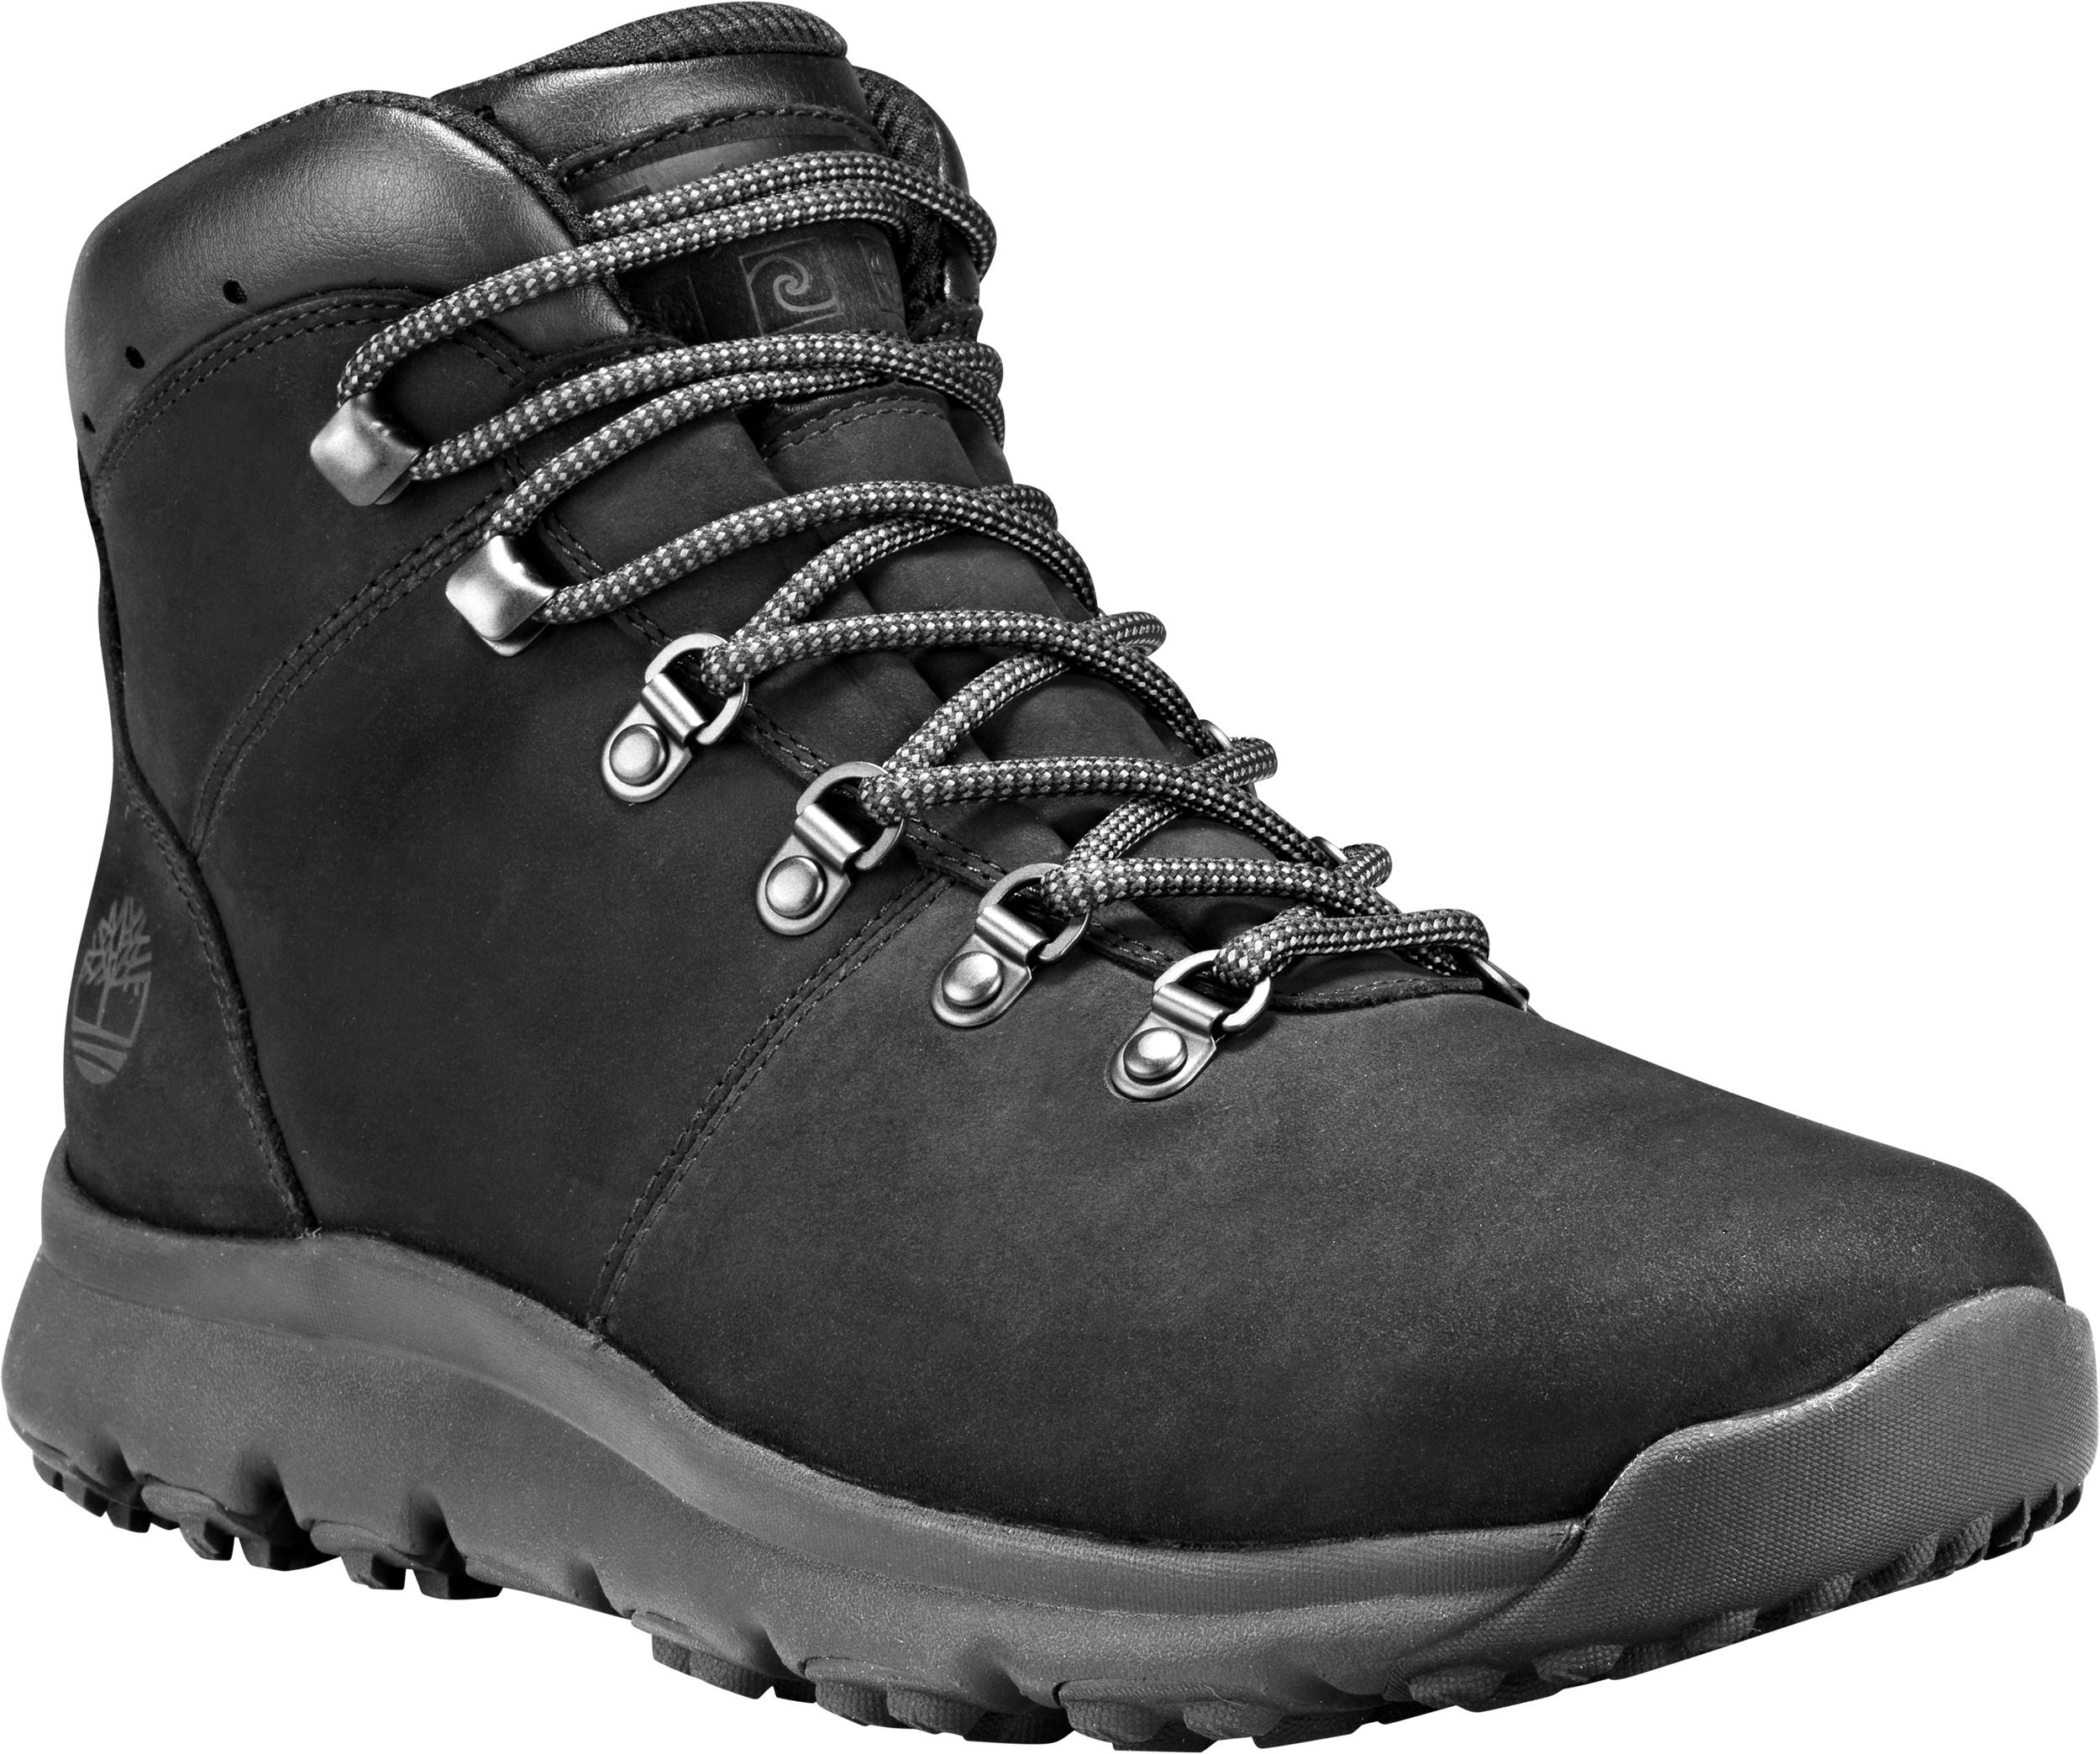 f1a67530800 Timberland World Hiker Mid Boots - Men's